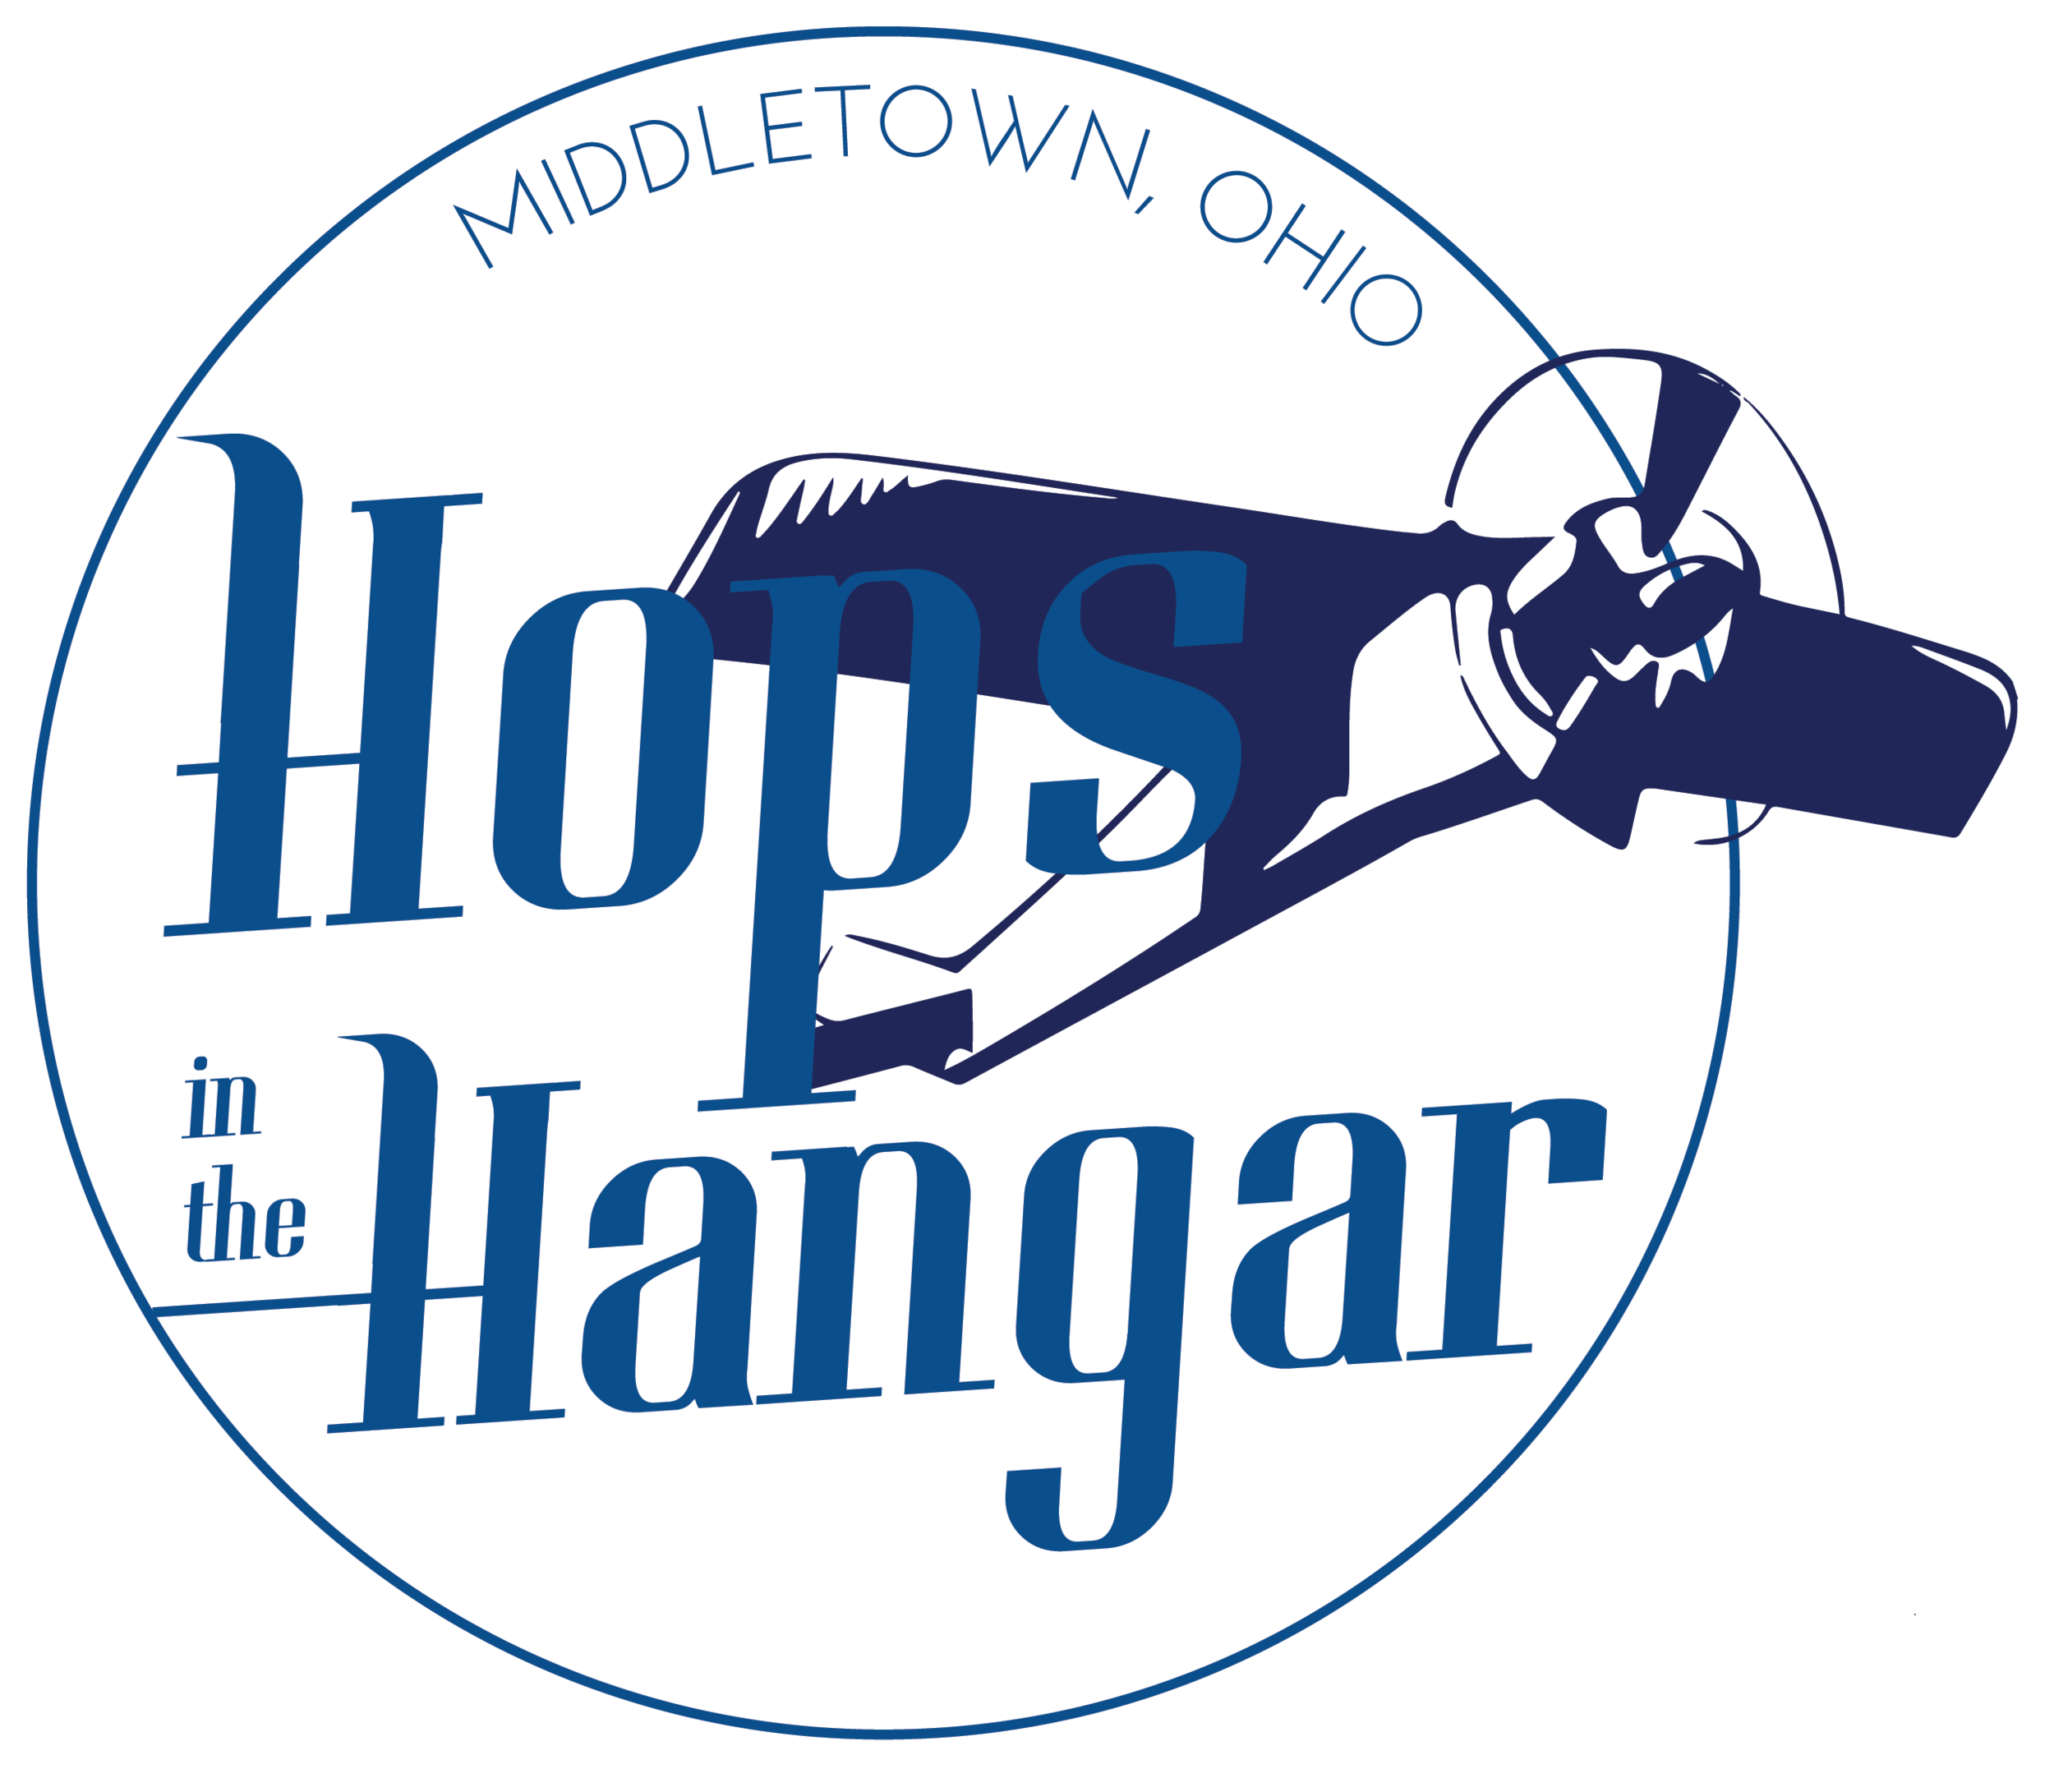 hops logo cropped.png